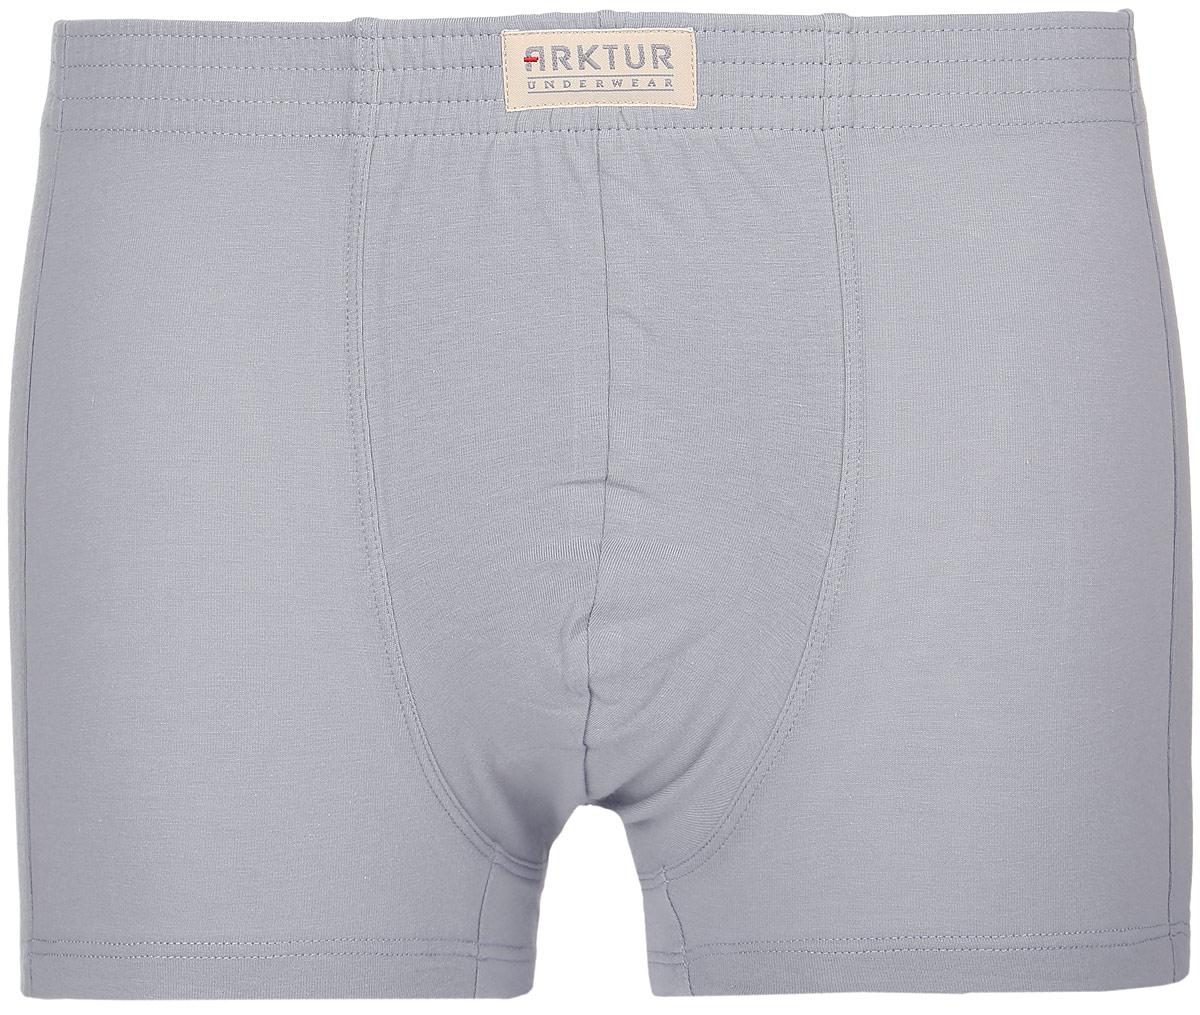 Трусы-боксеры мужские Arktur Toronto, цвет: светло-серый. Размер S (46)